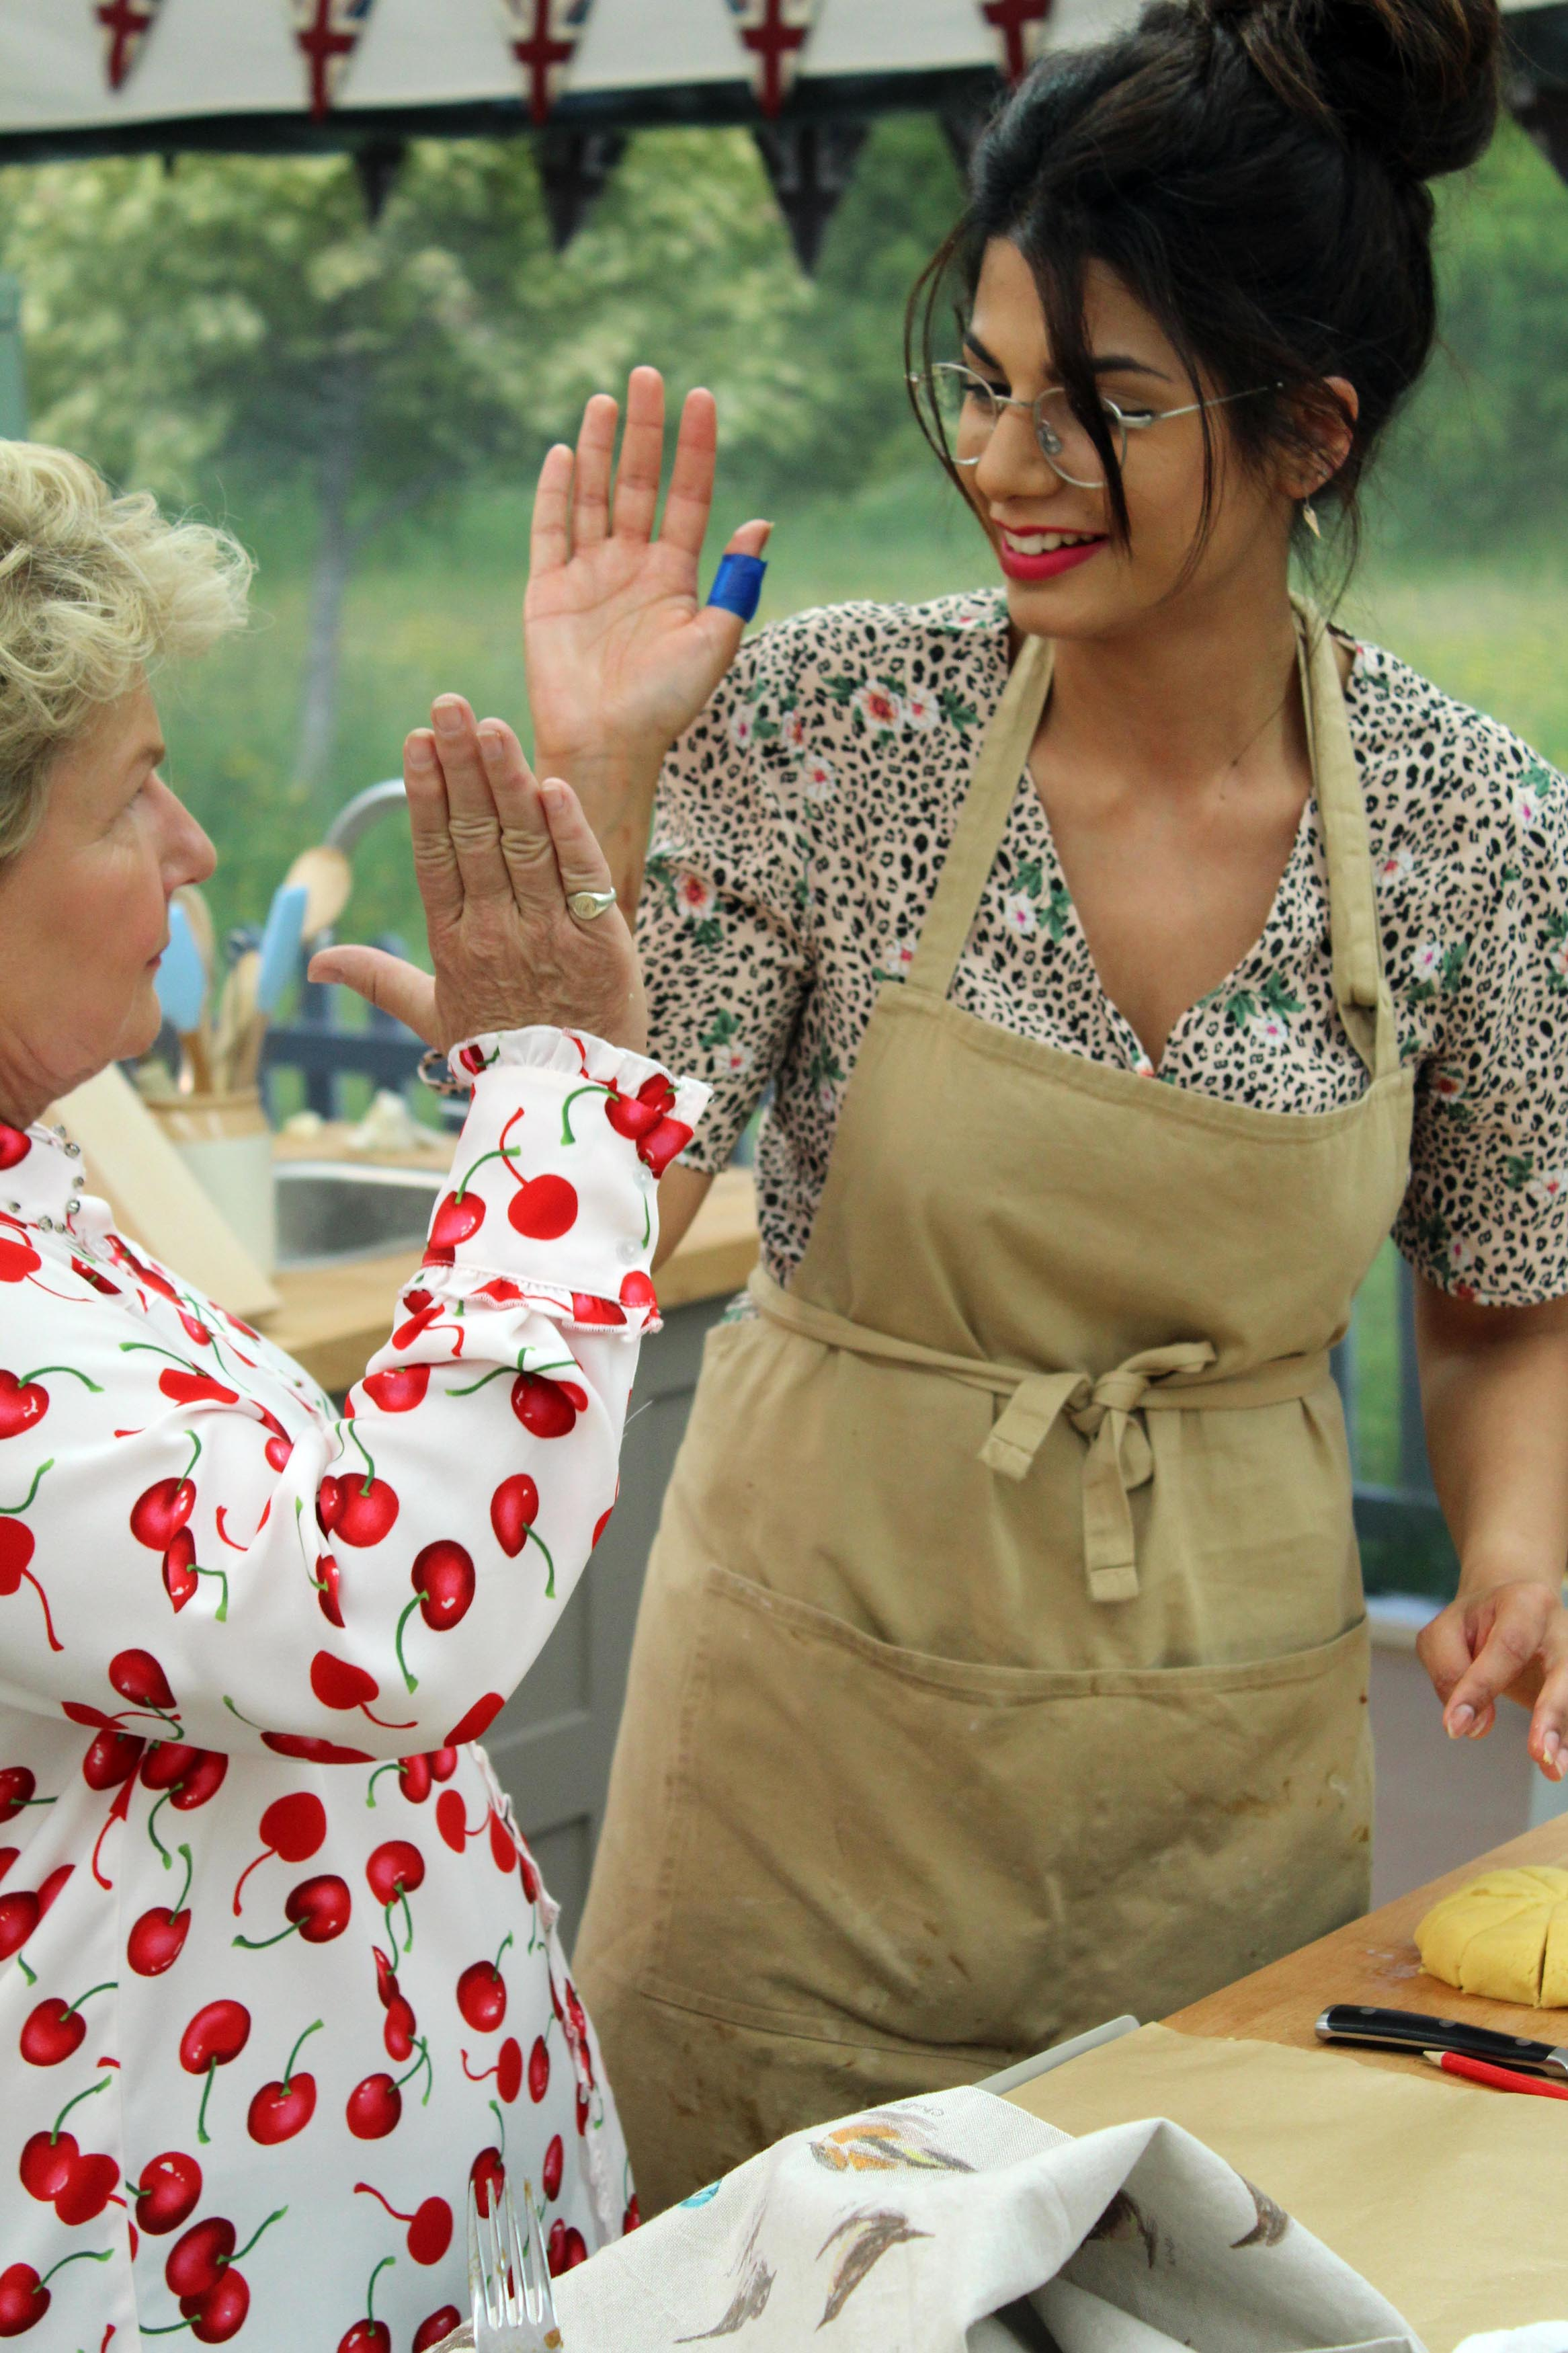 Episode 5, Technical Bake; Sandi with Ruby baking